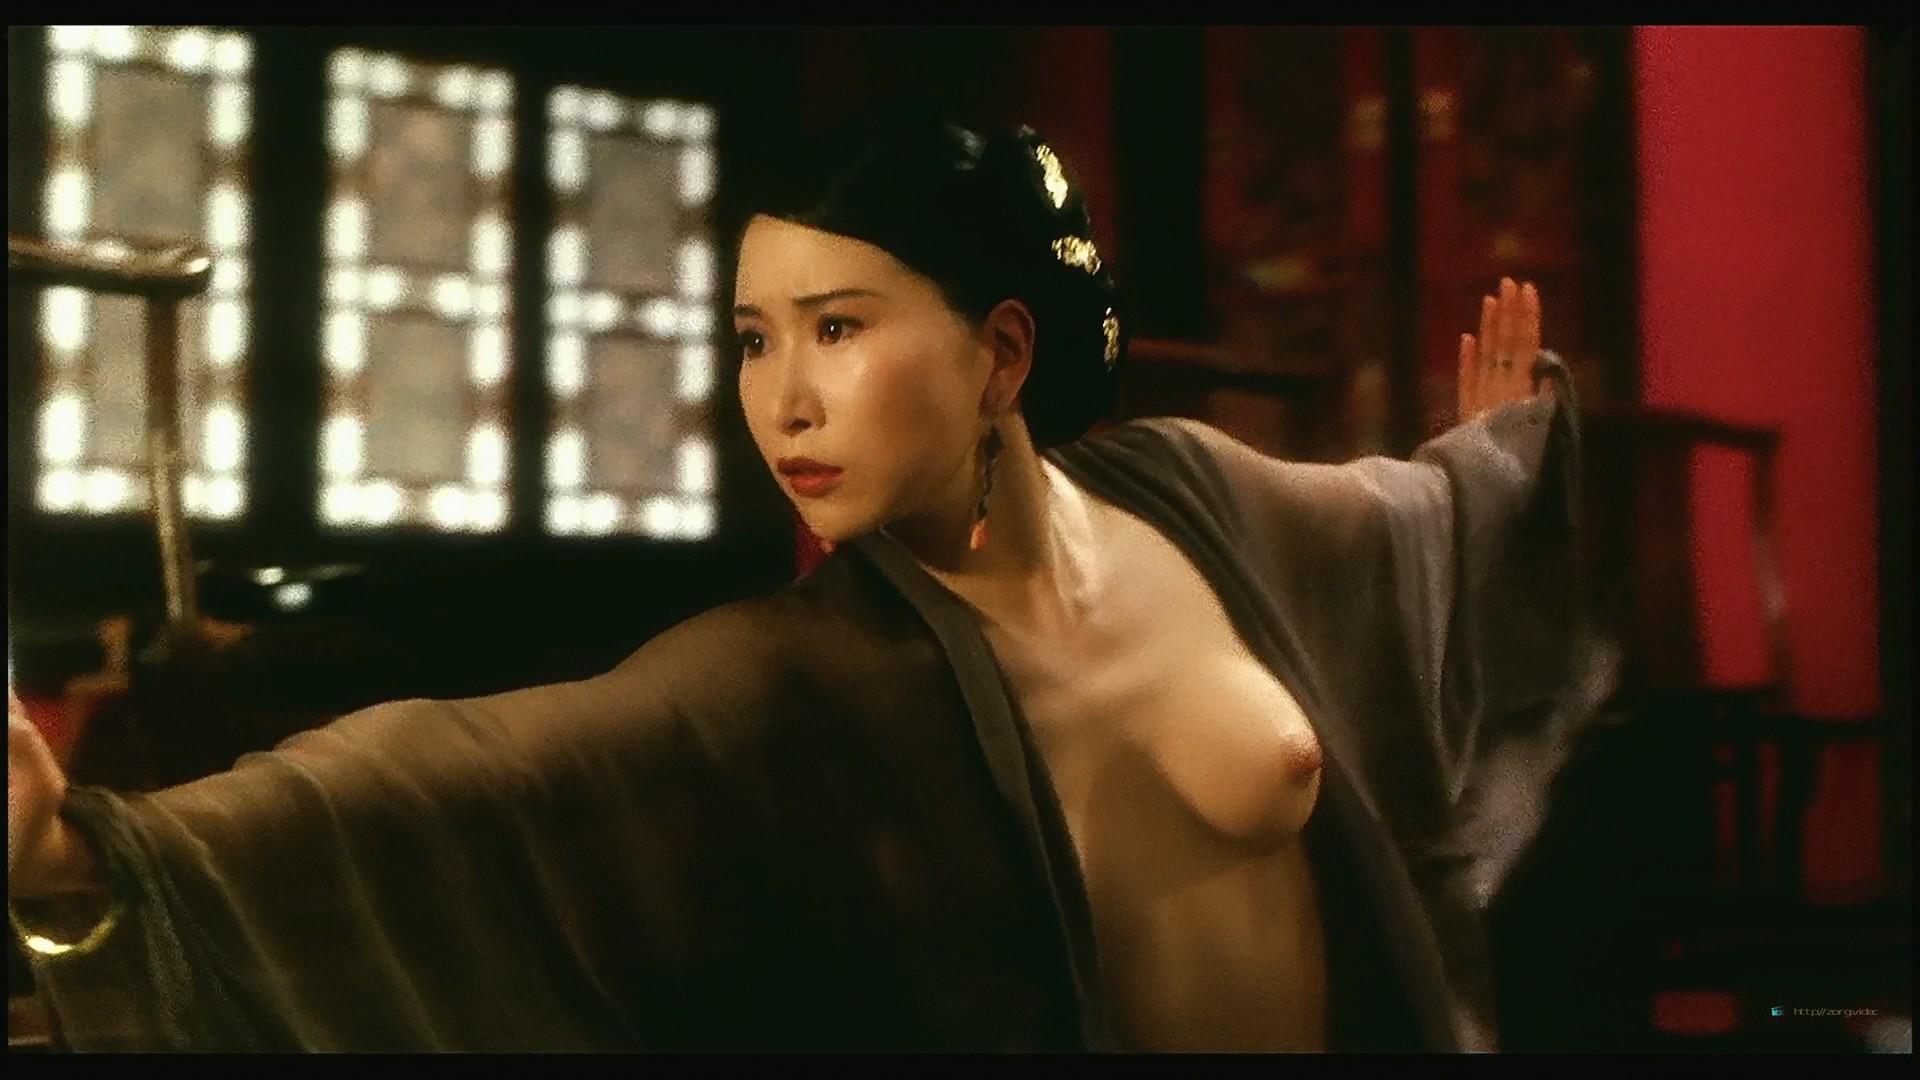 Yvonne yung scene sex